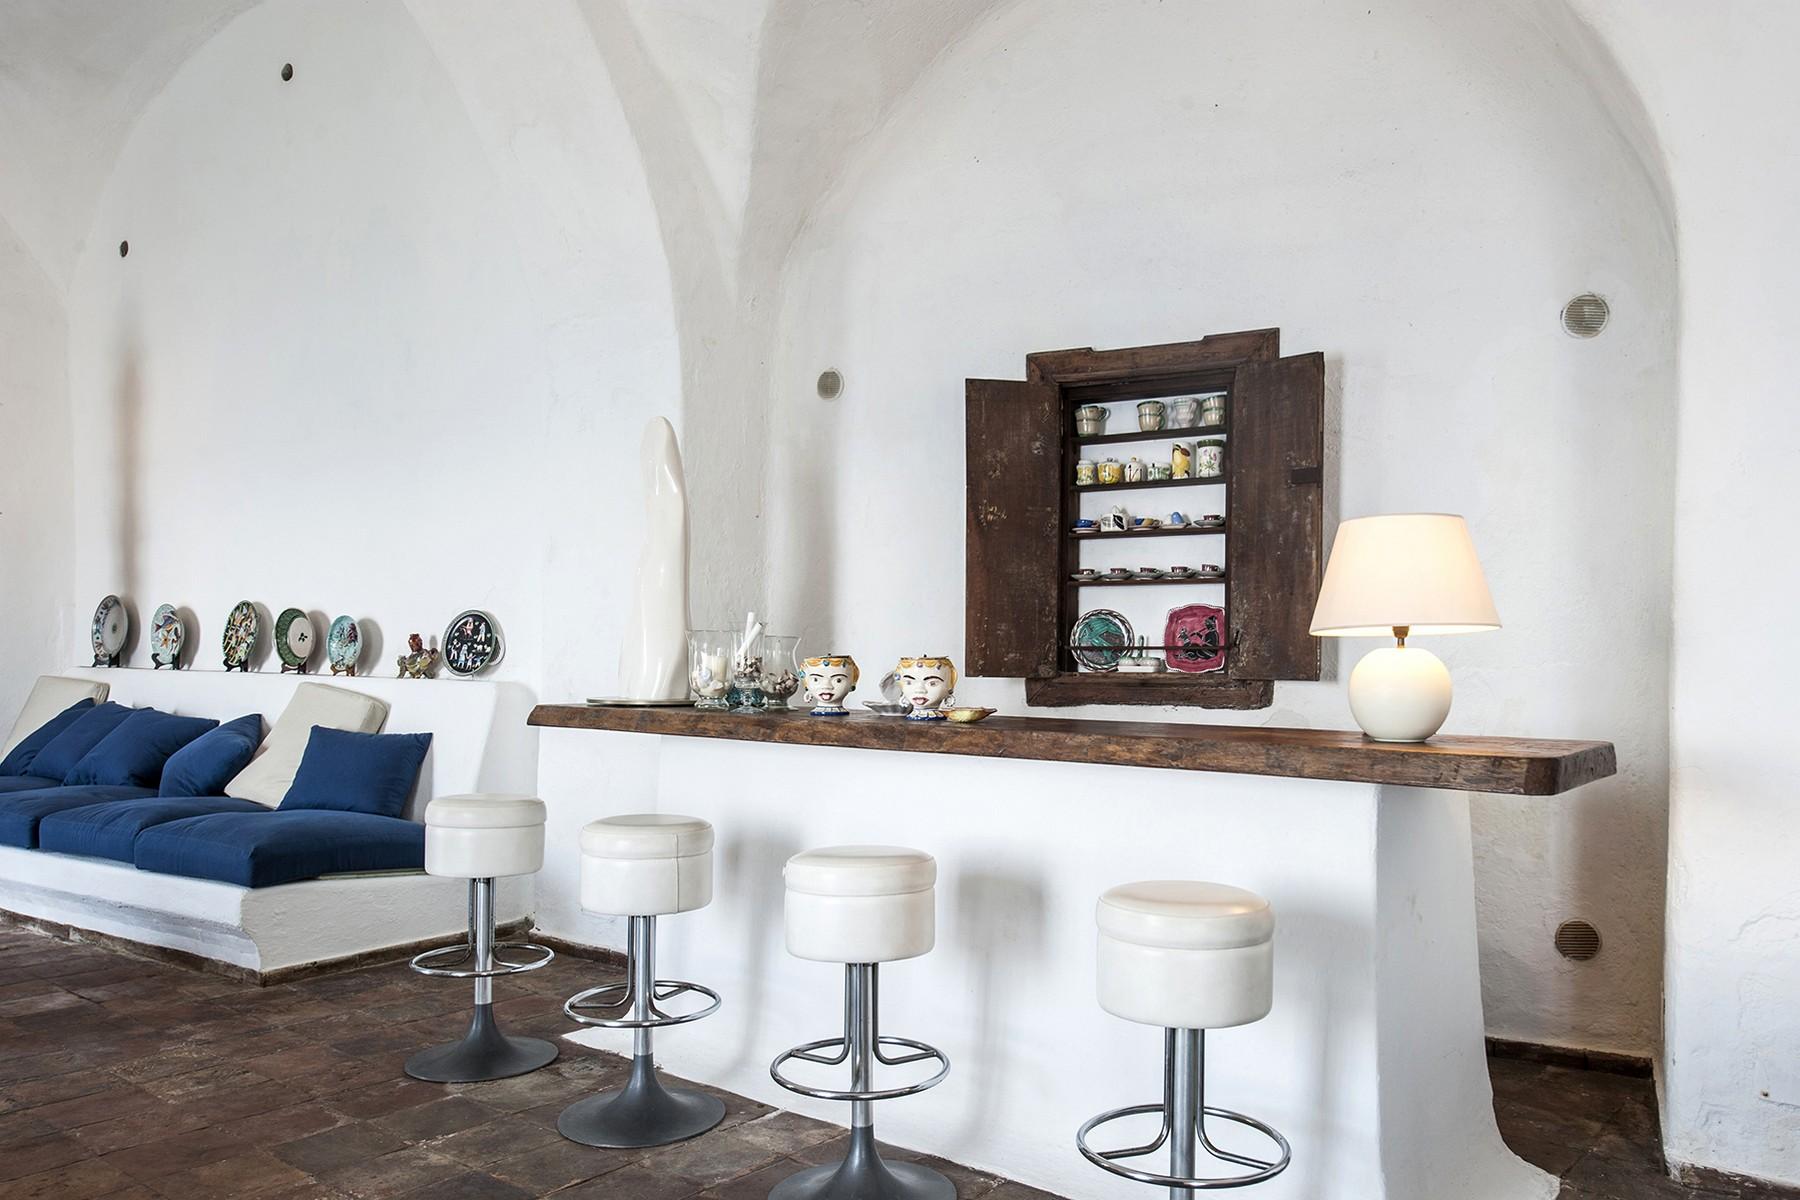 Additional photo for property listing at Villa Chandon Via Marina Conca Dei Marini, Salerno 84010 Italy